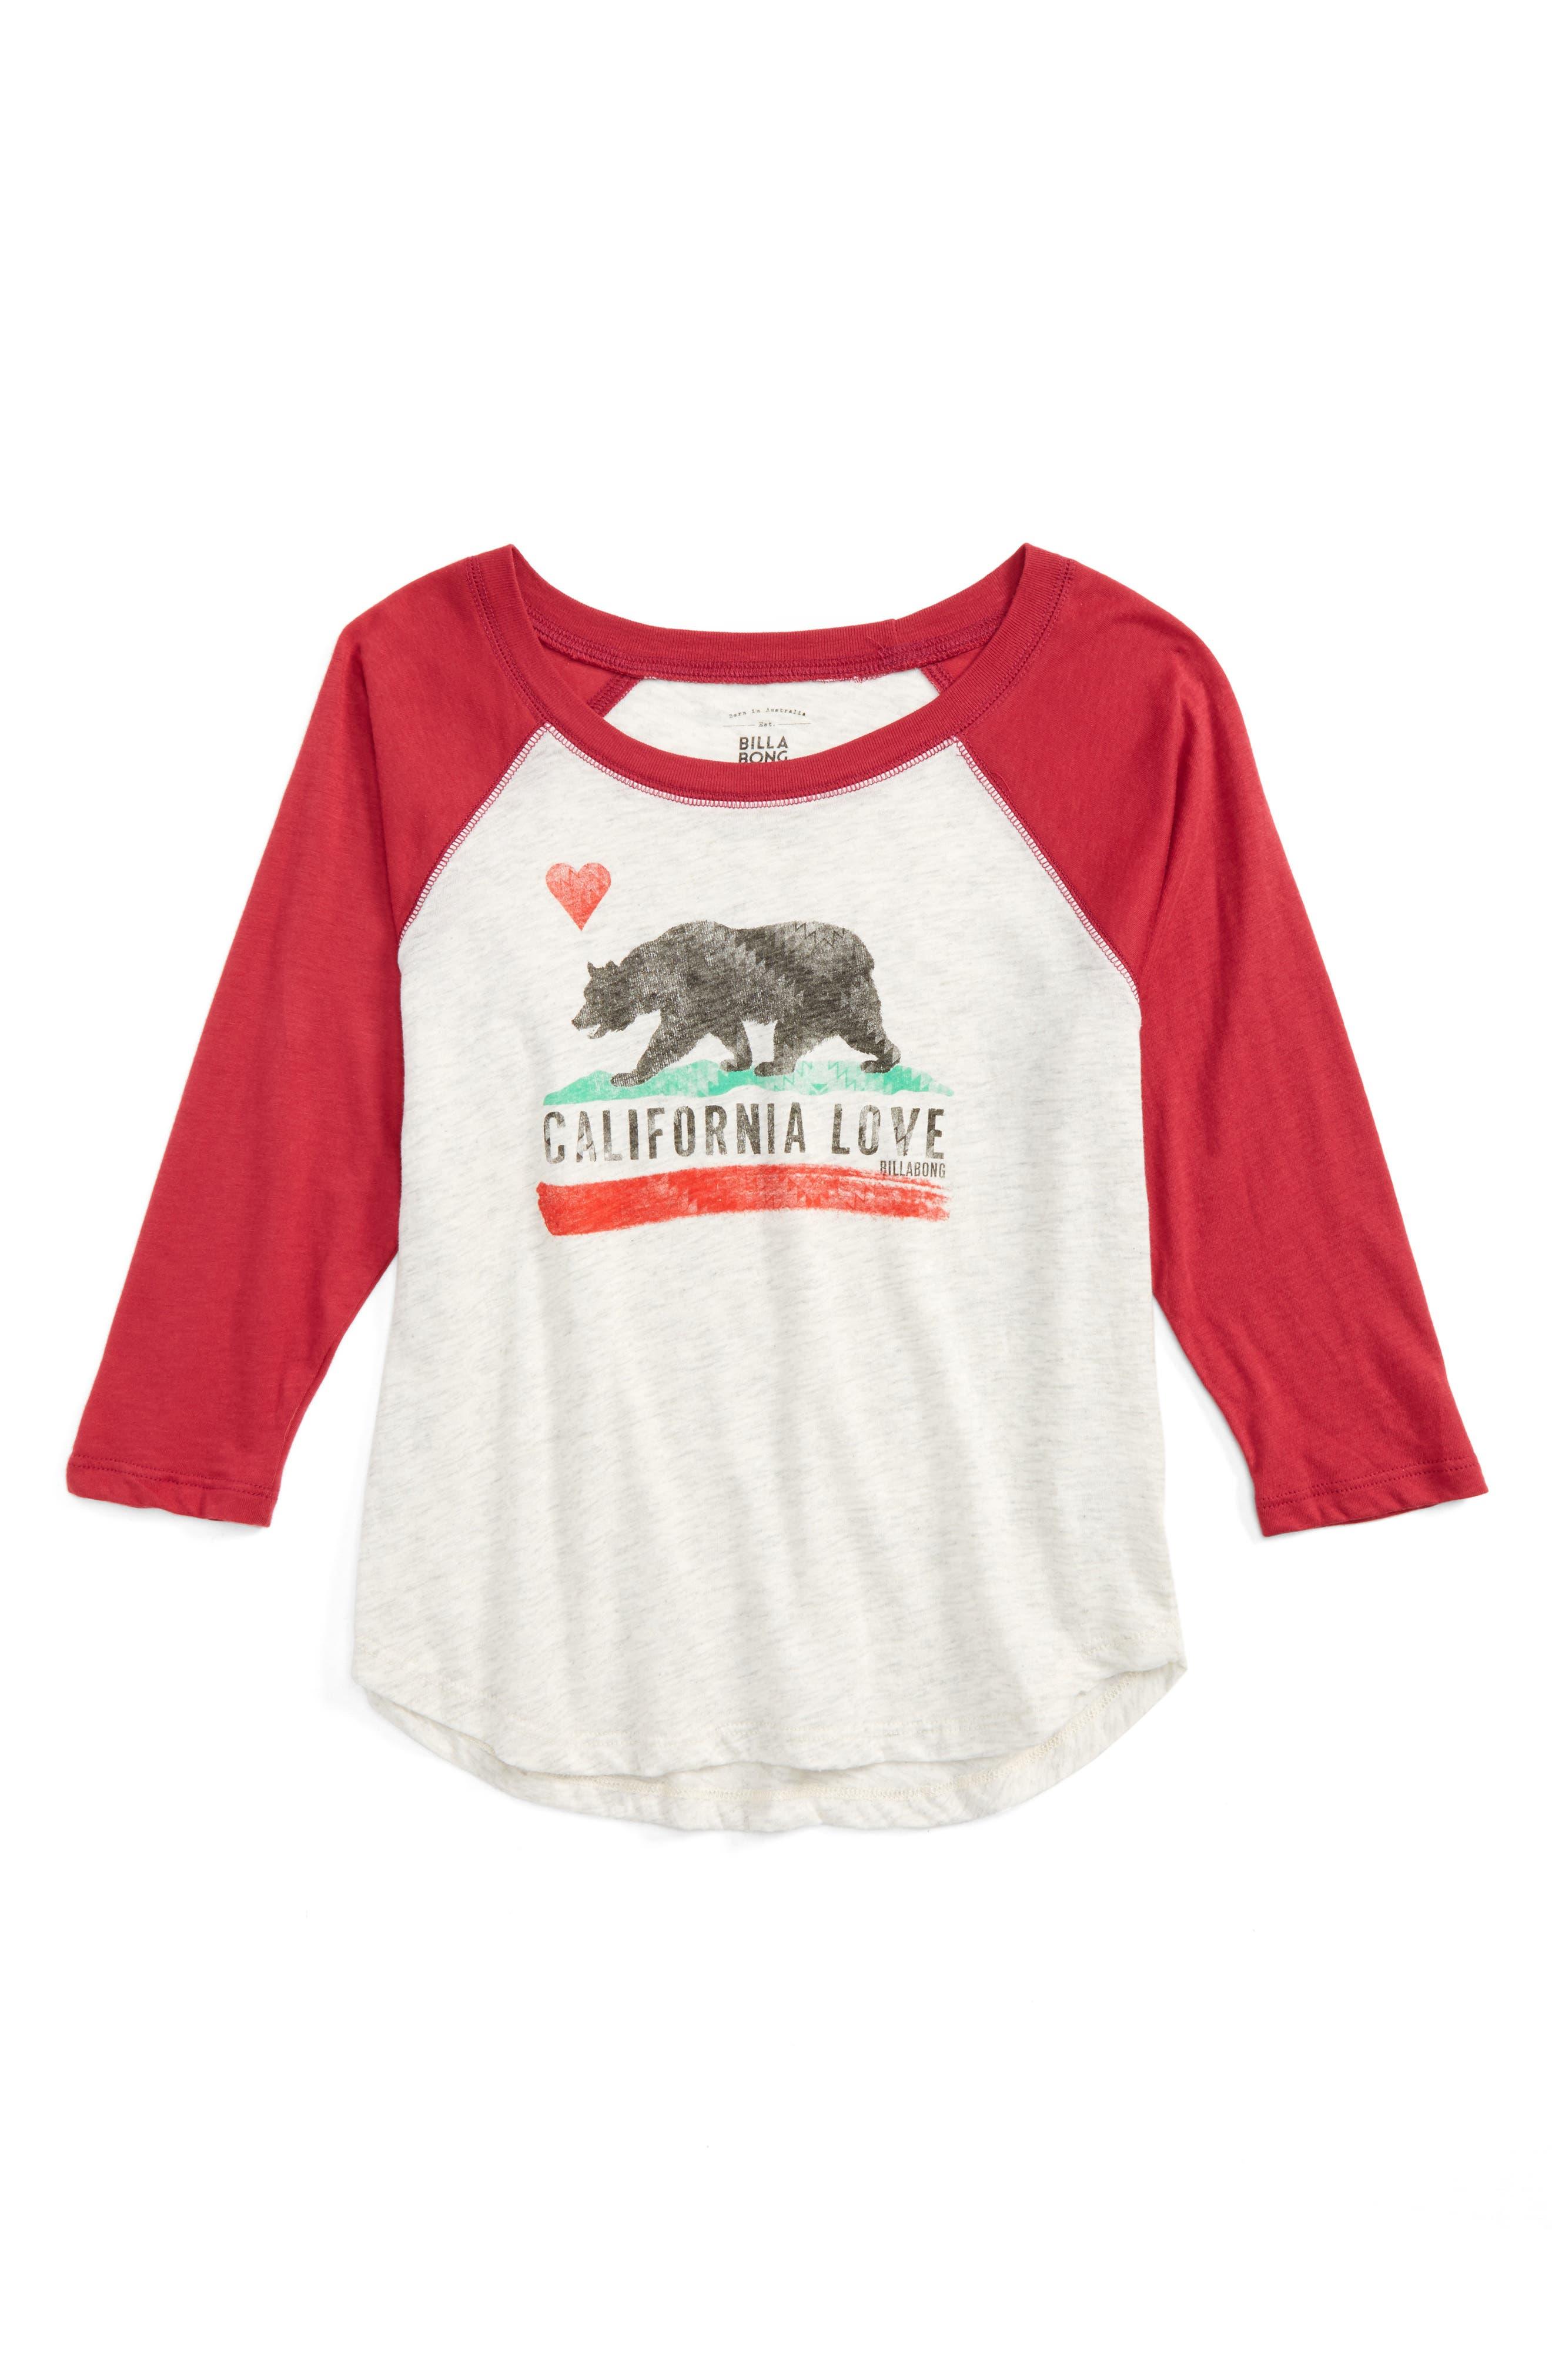 Main Image - Billabong Cali Bear Original Graphic Tee (Little Girls & Big Girls)